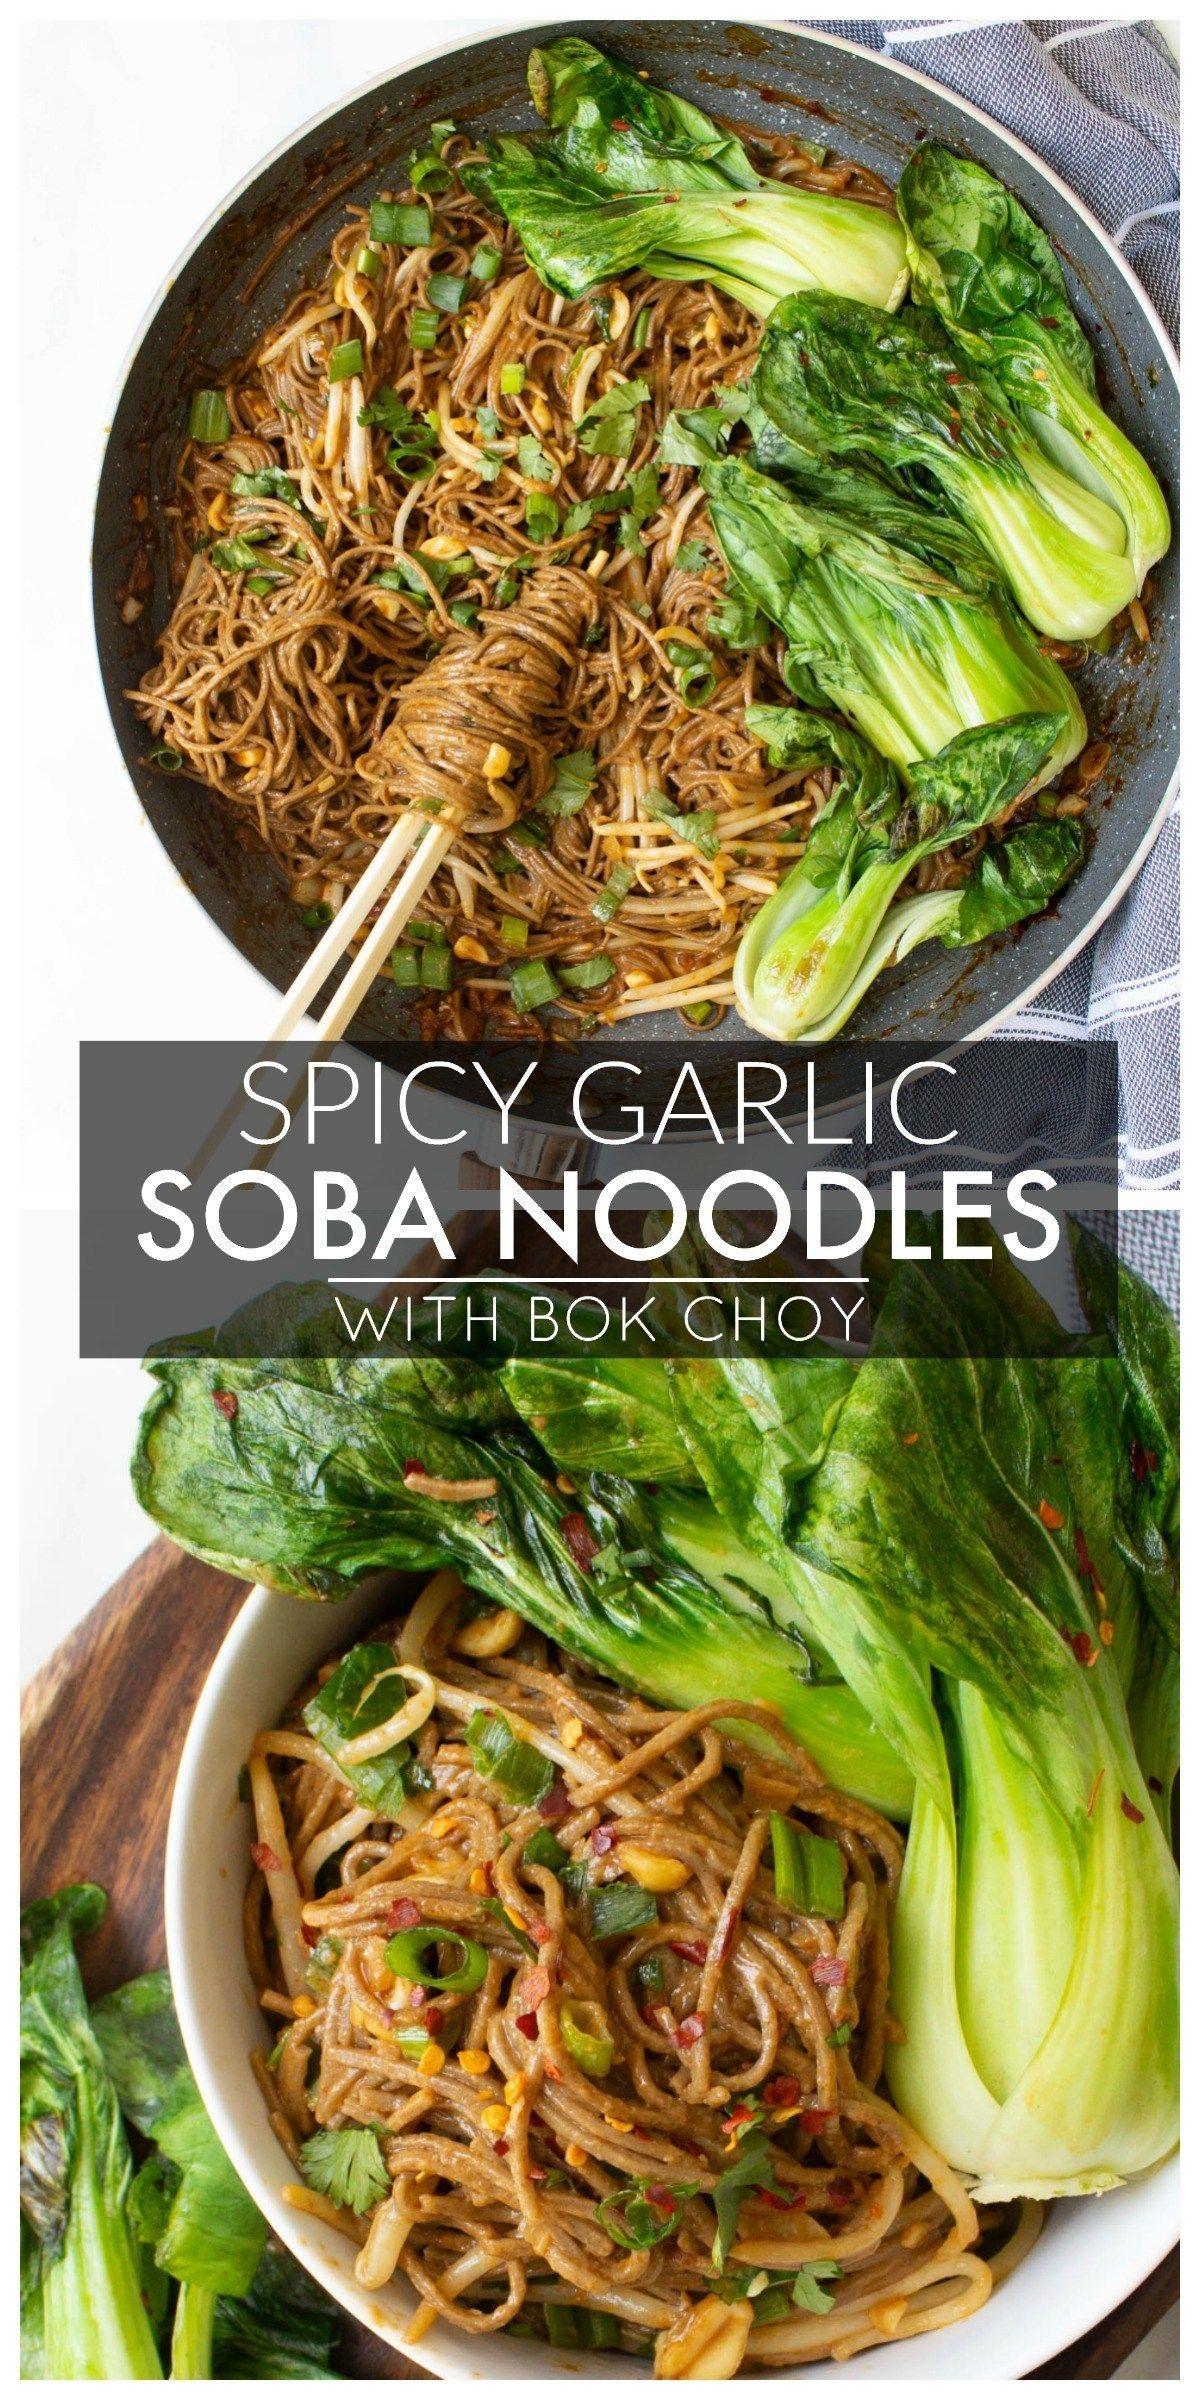 Spicy Garlic Soba Noodles with Bok Choy - This Savory Vegan - Vegetarian recipes -